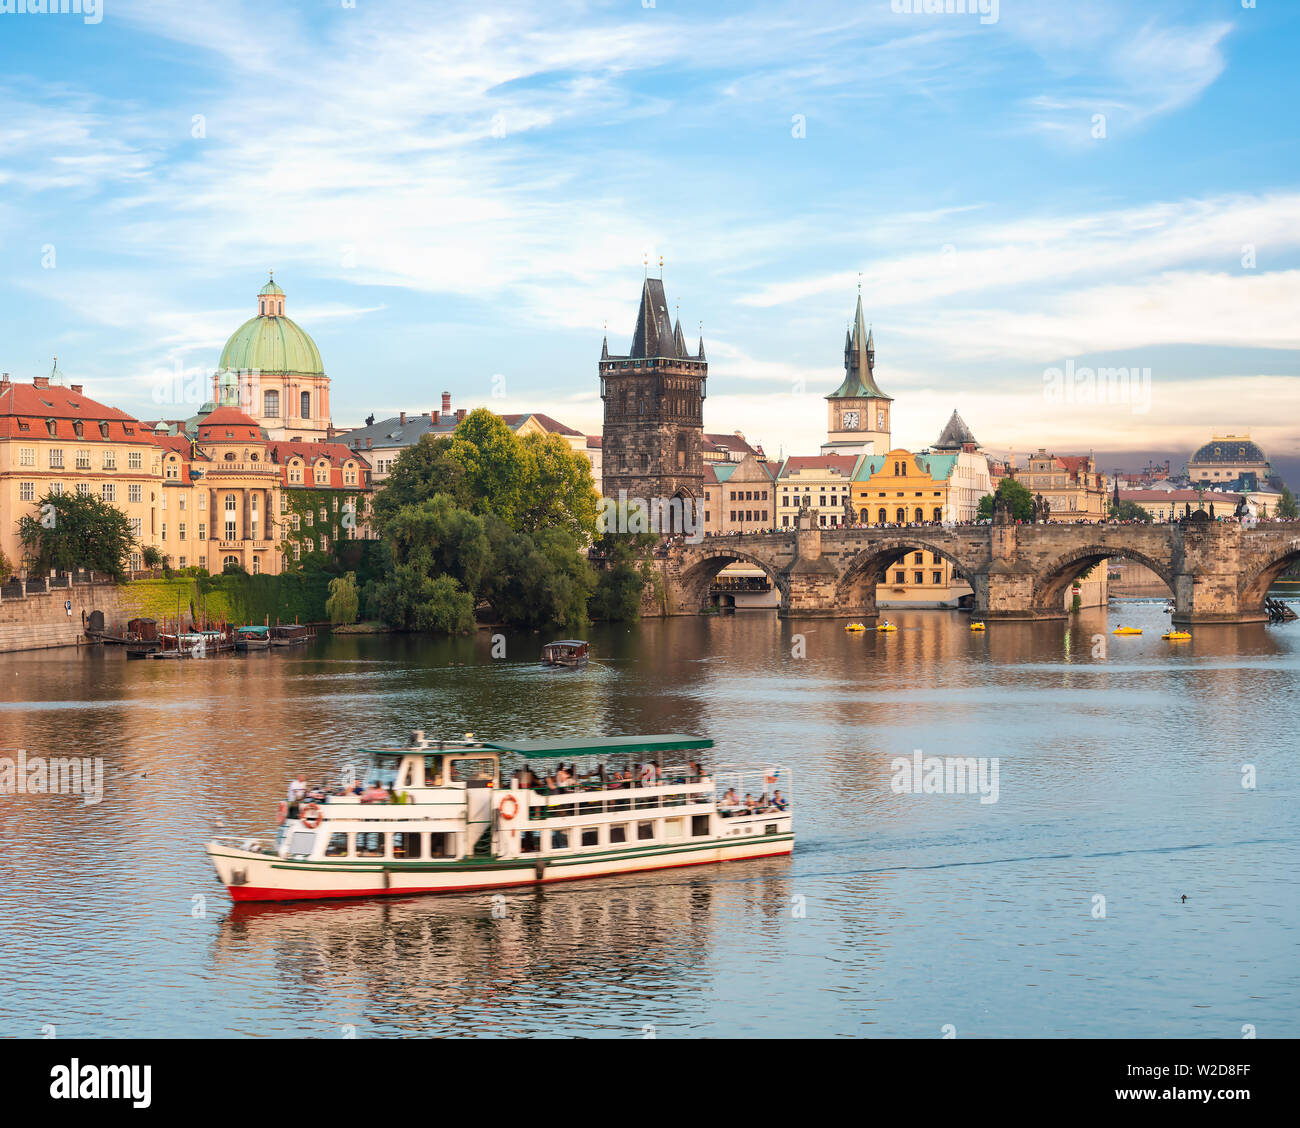 Touristic boat near the Charles bridge in Prague - Stock Image